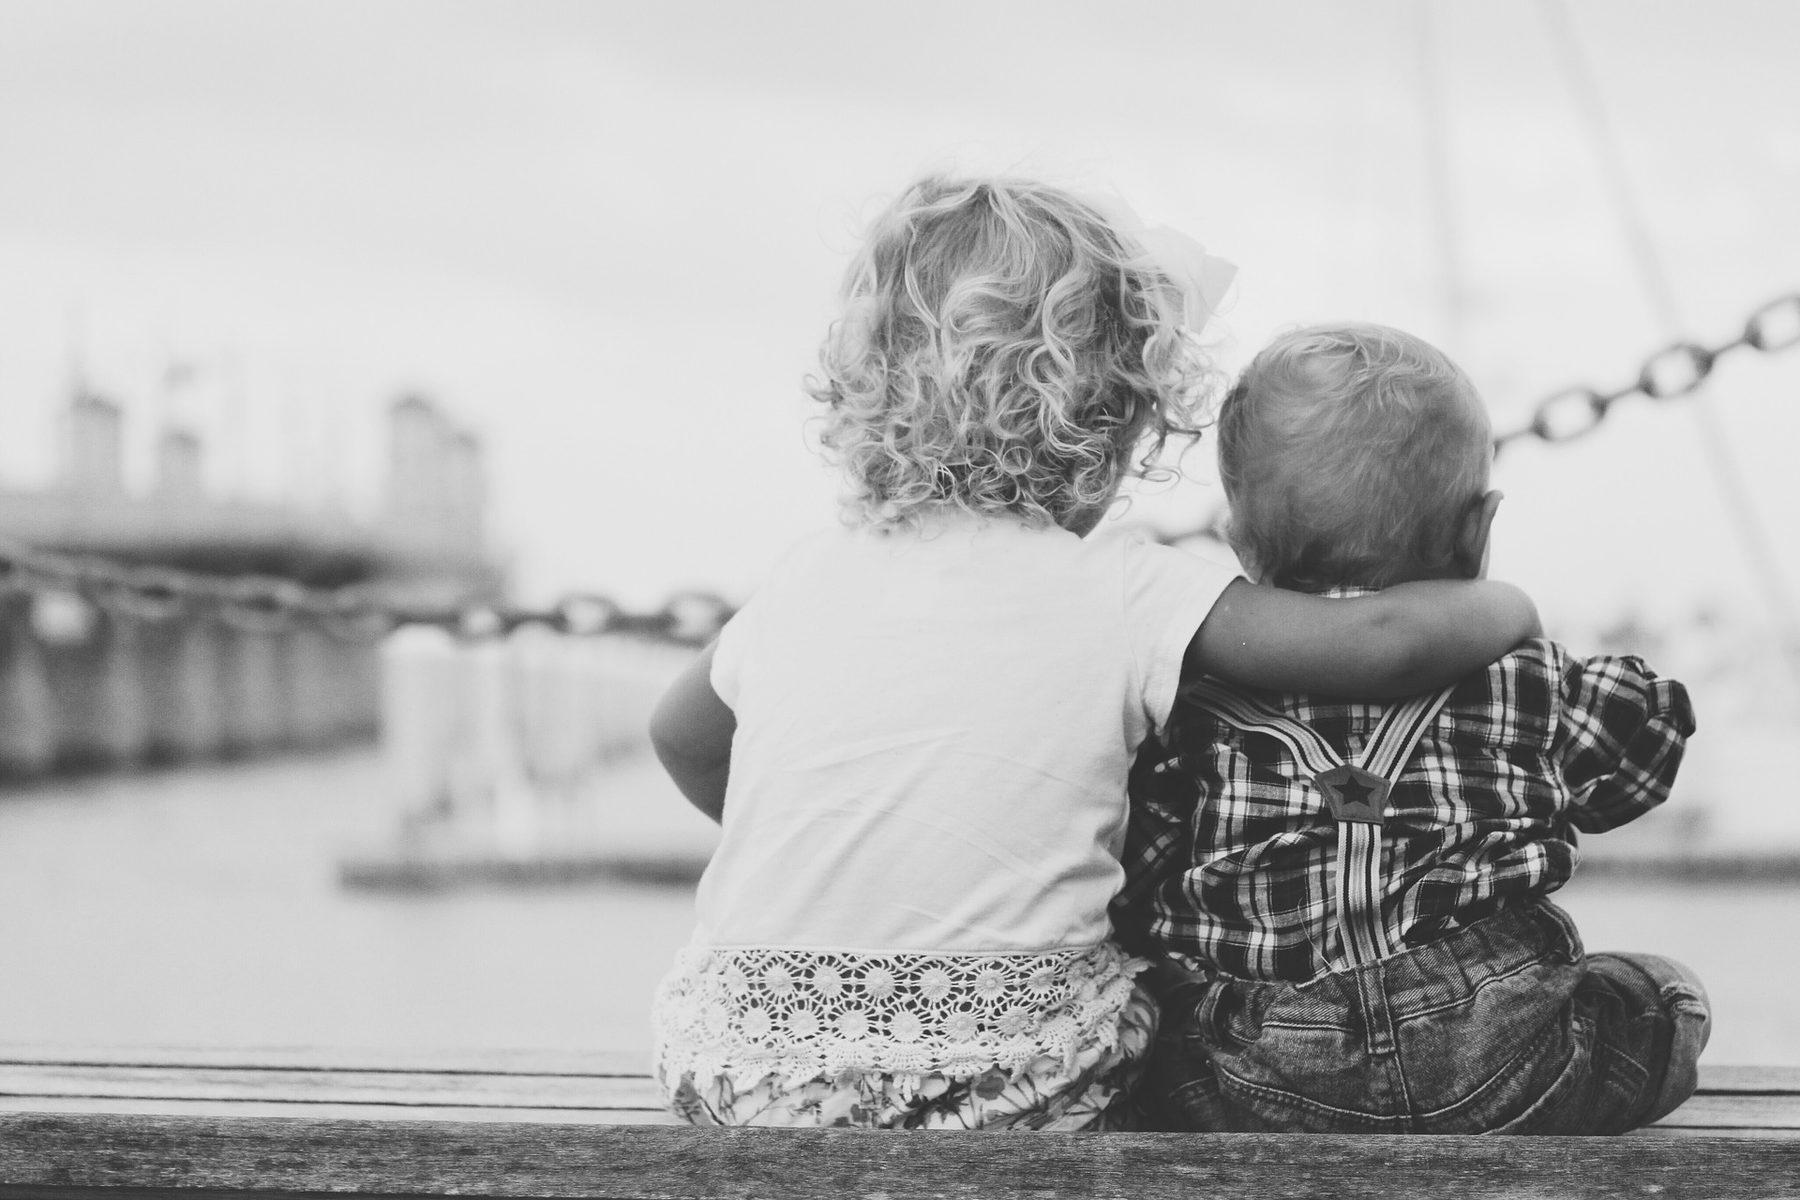 Social Care (Sector Header: Children Hugging)